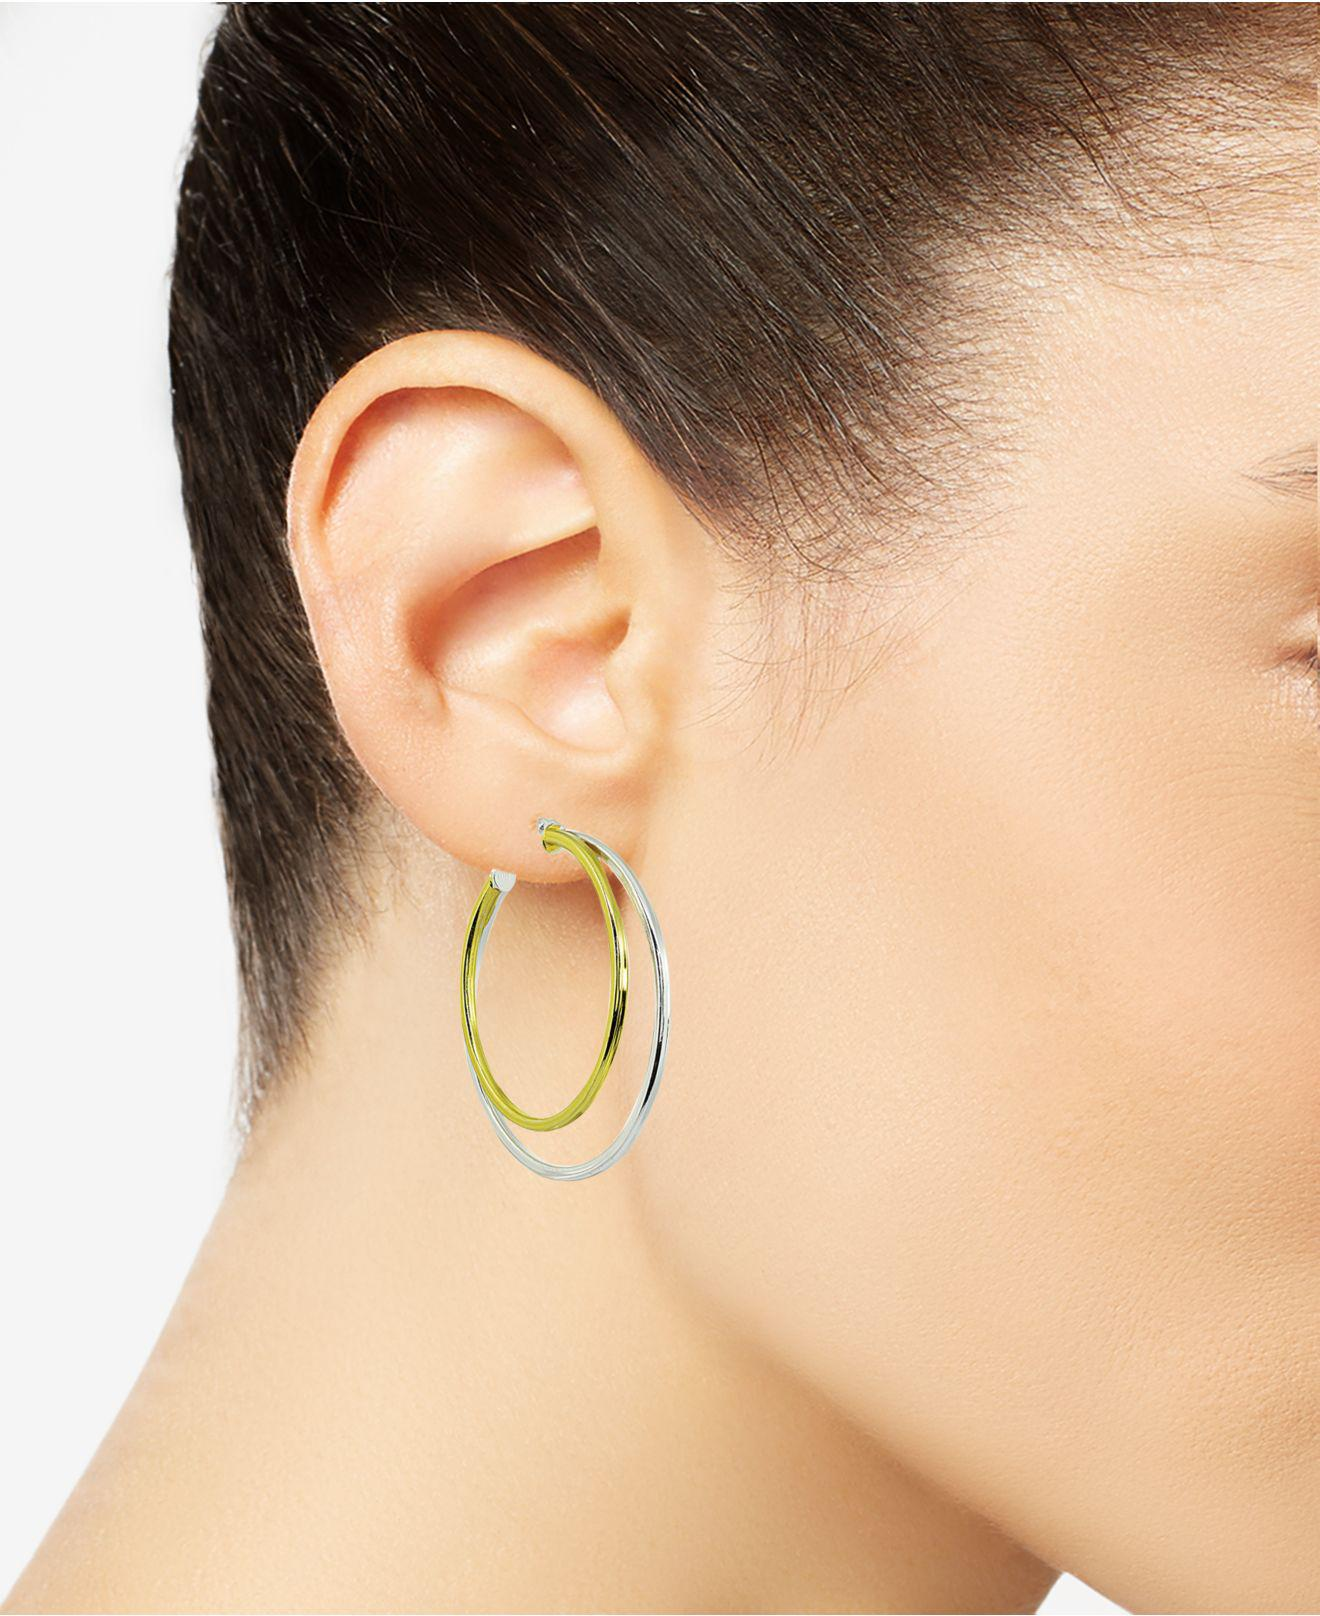 5686cb4d8 Giani Bernini Medium Two-tone Double Hoop Earrings In Sterling Silver & 18k  Gold-plated Sterling Silver, 1.5